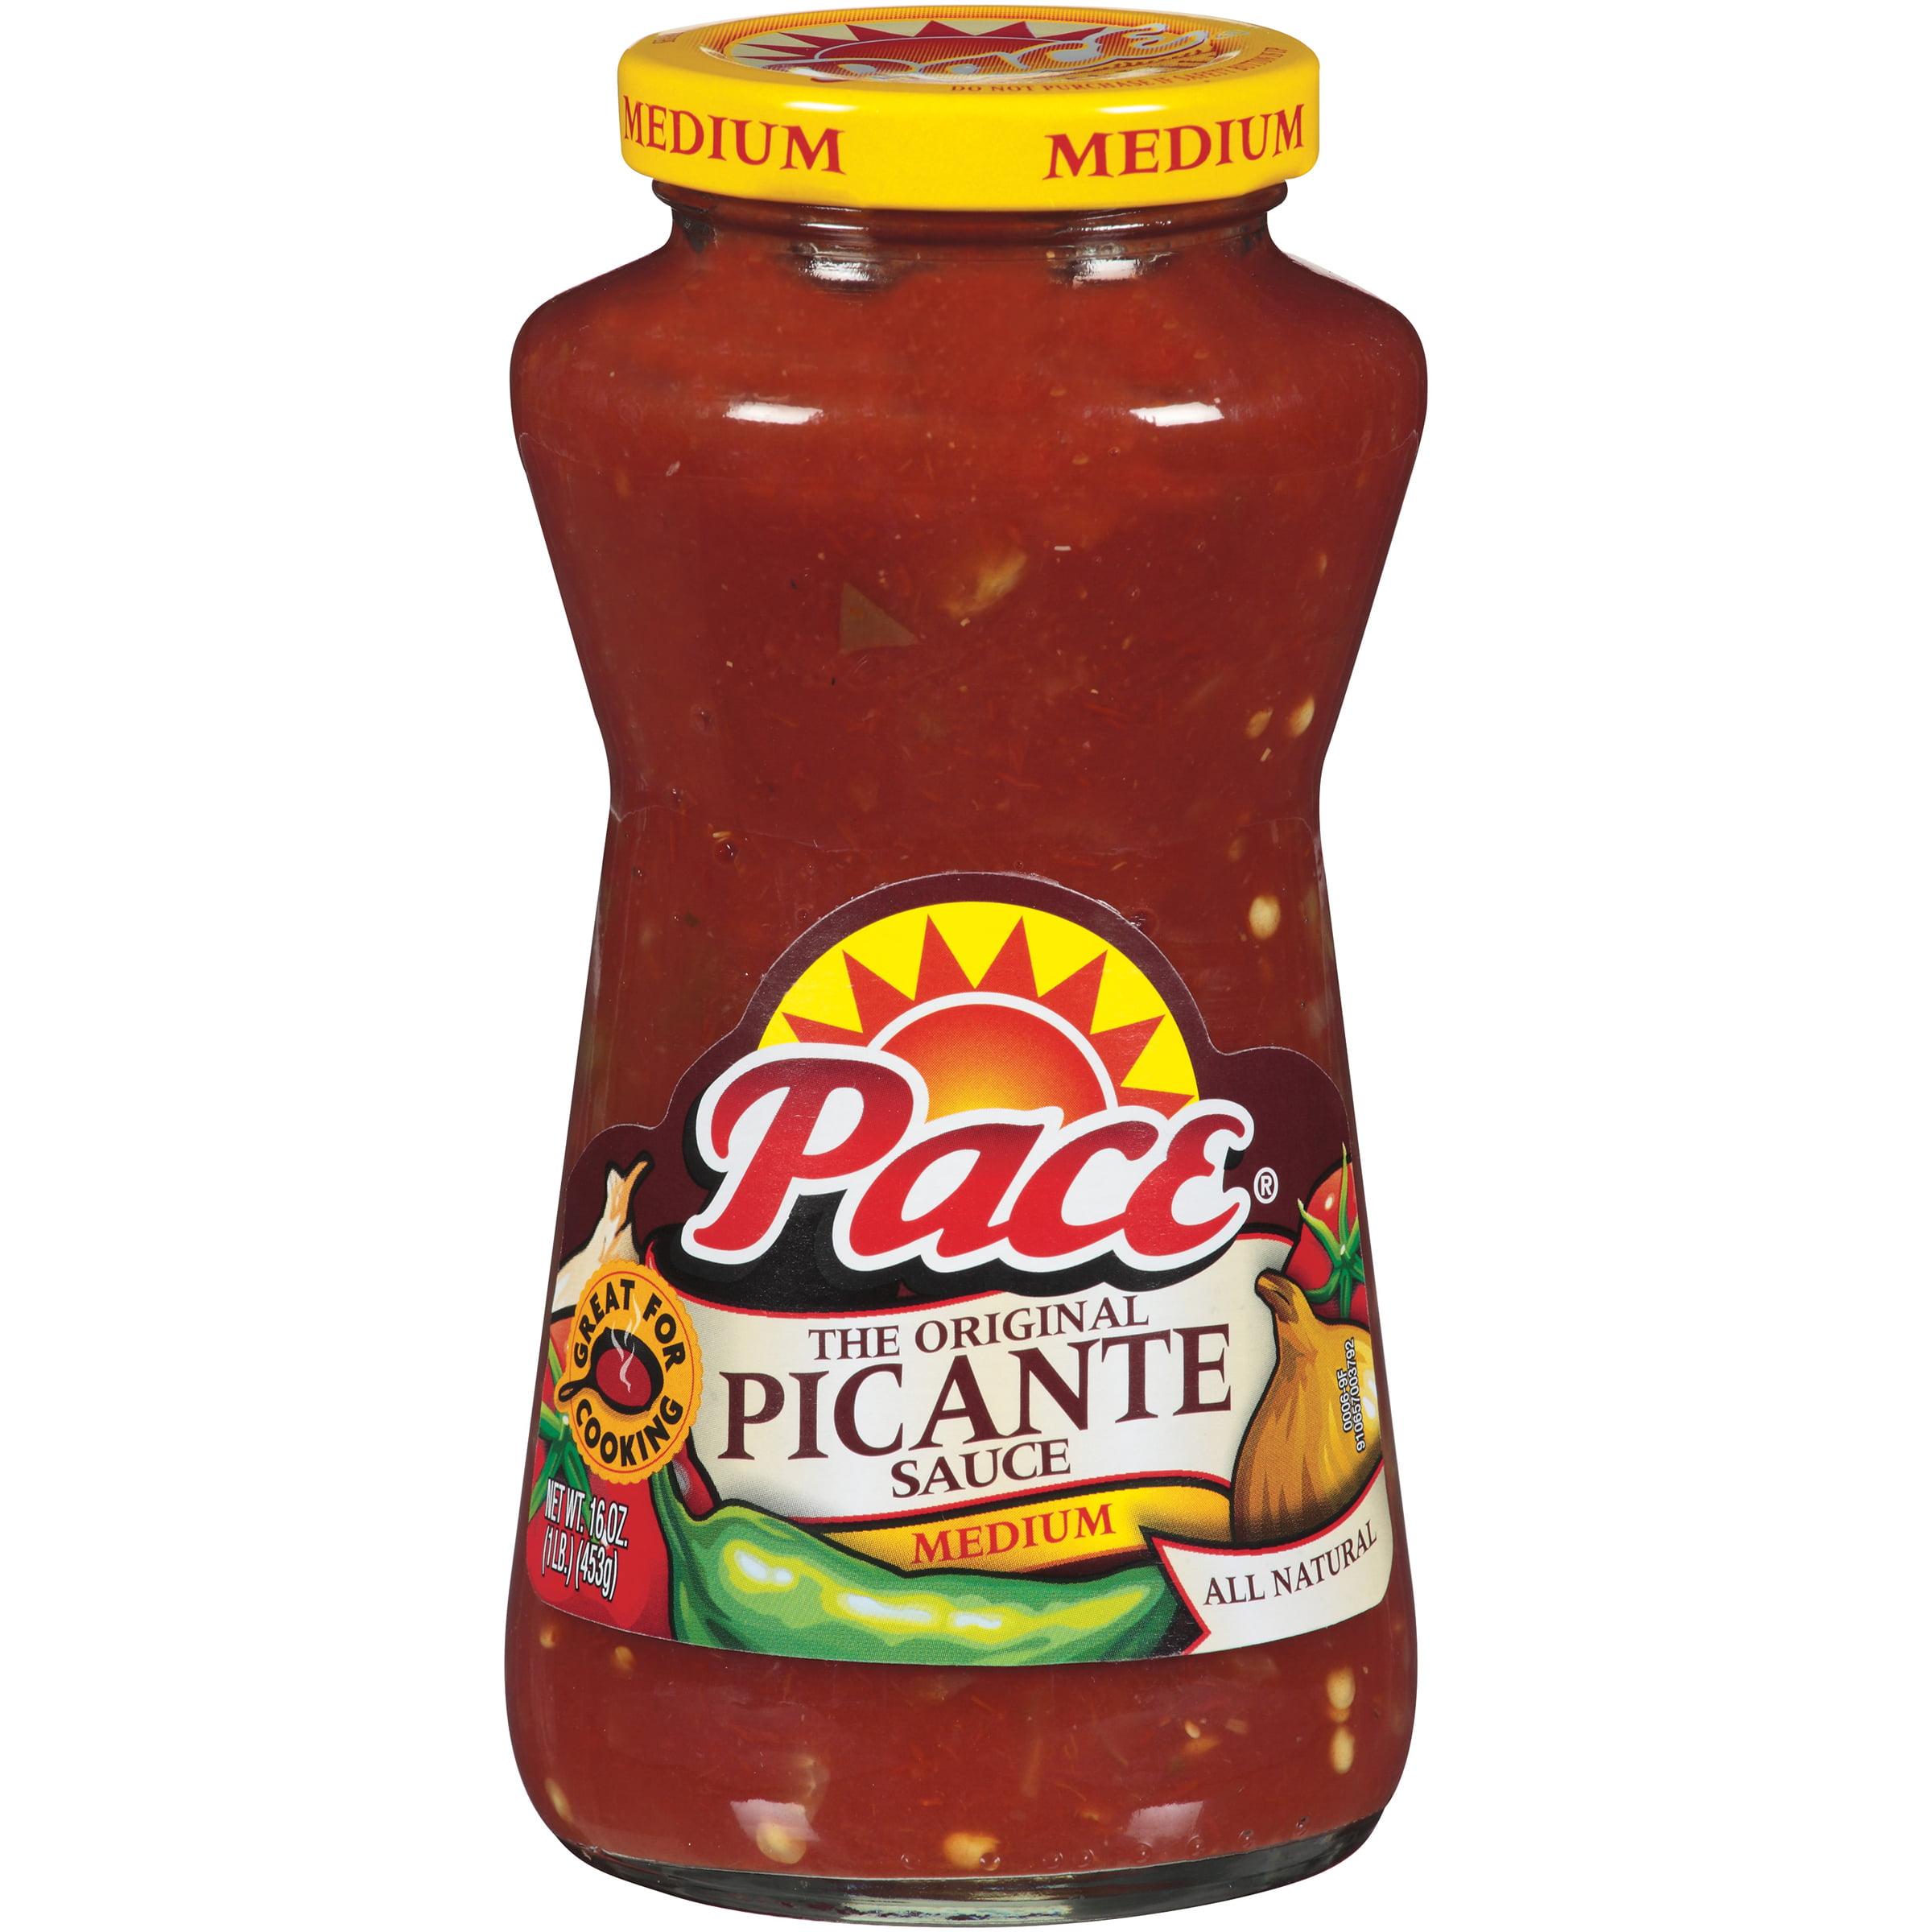 Pace Medium Picante Sauce 16oz